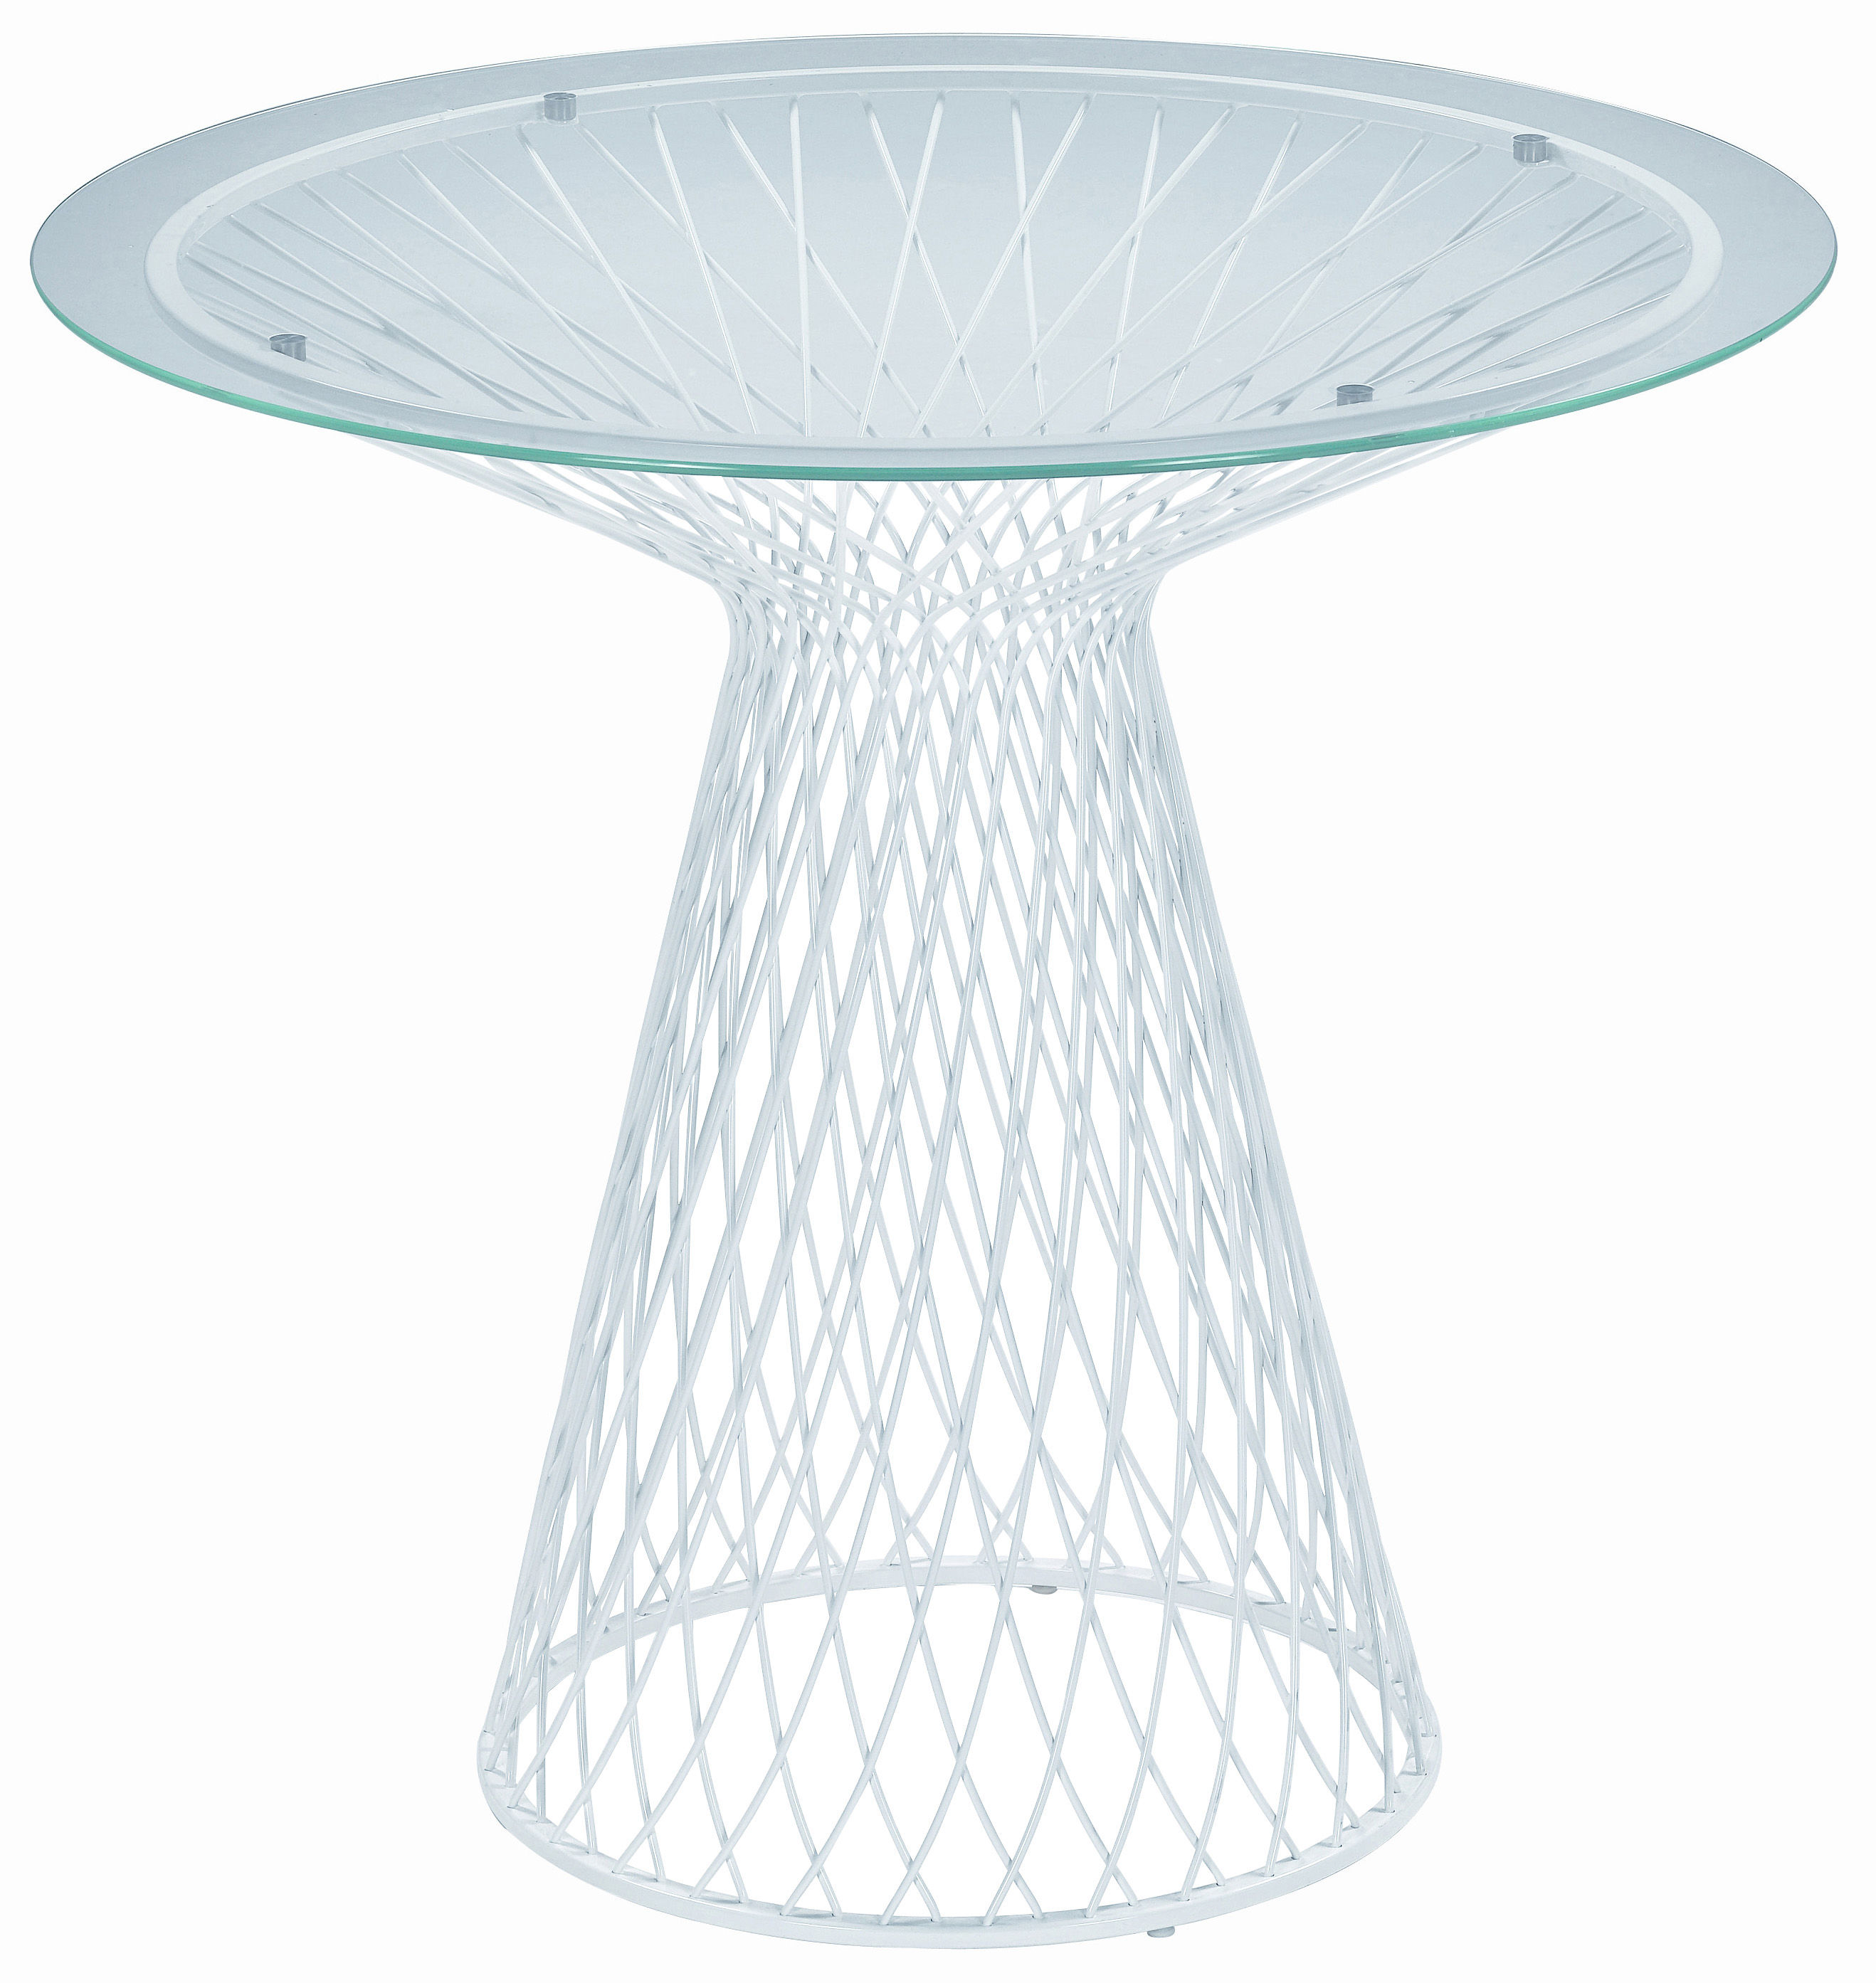 Outdoor - Garden Tables - Heaven Garden table - Ø 80 by Emu - Matt white - Glass, Steel